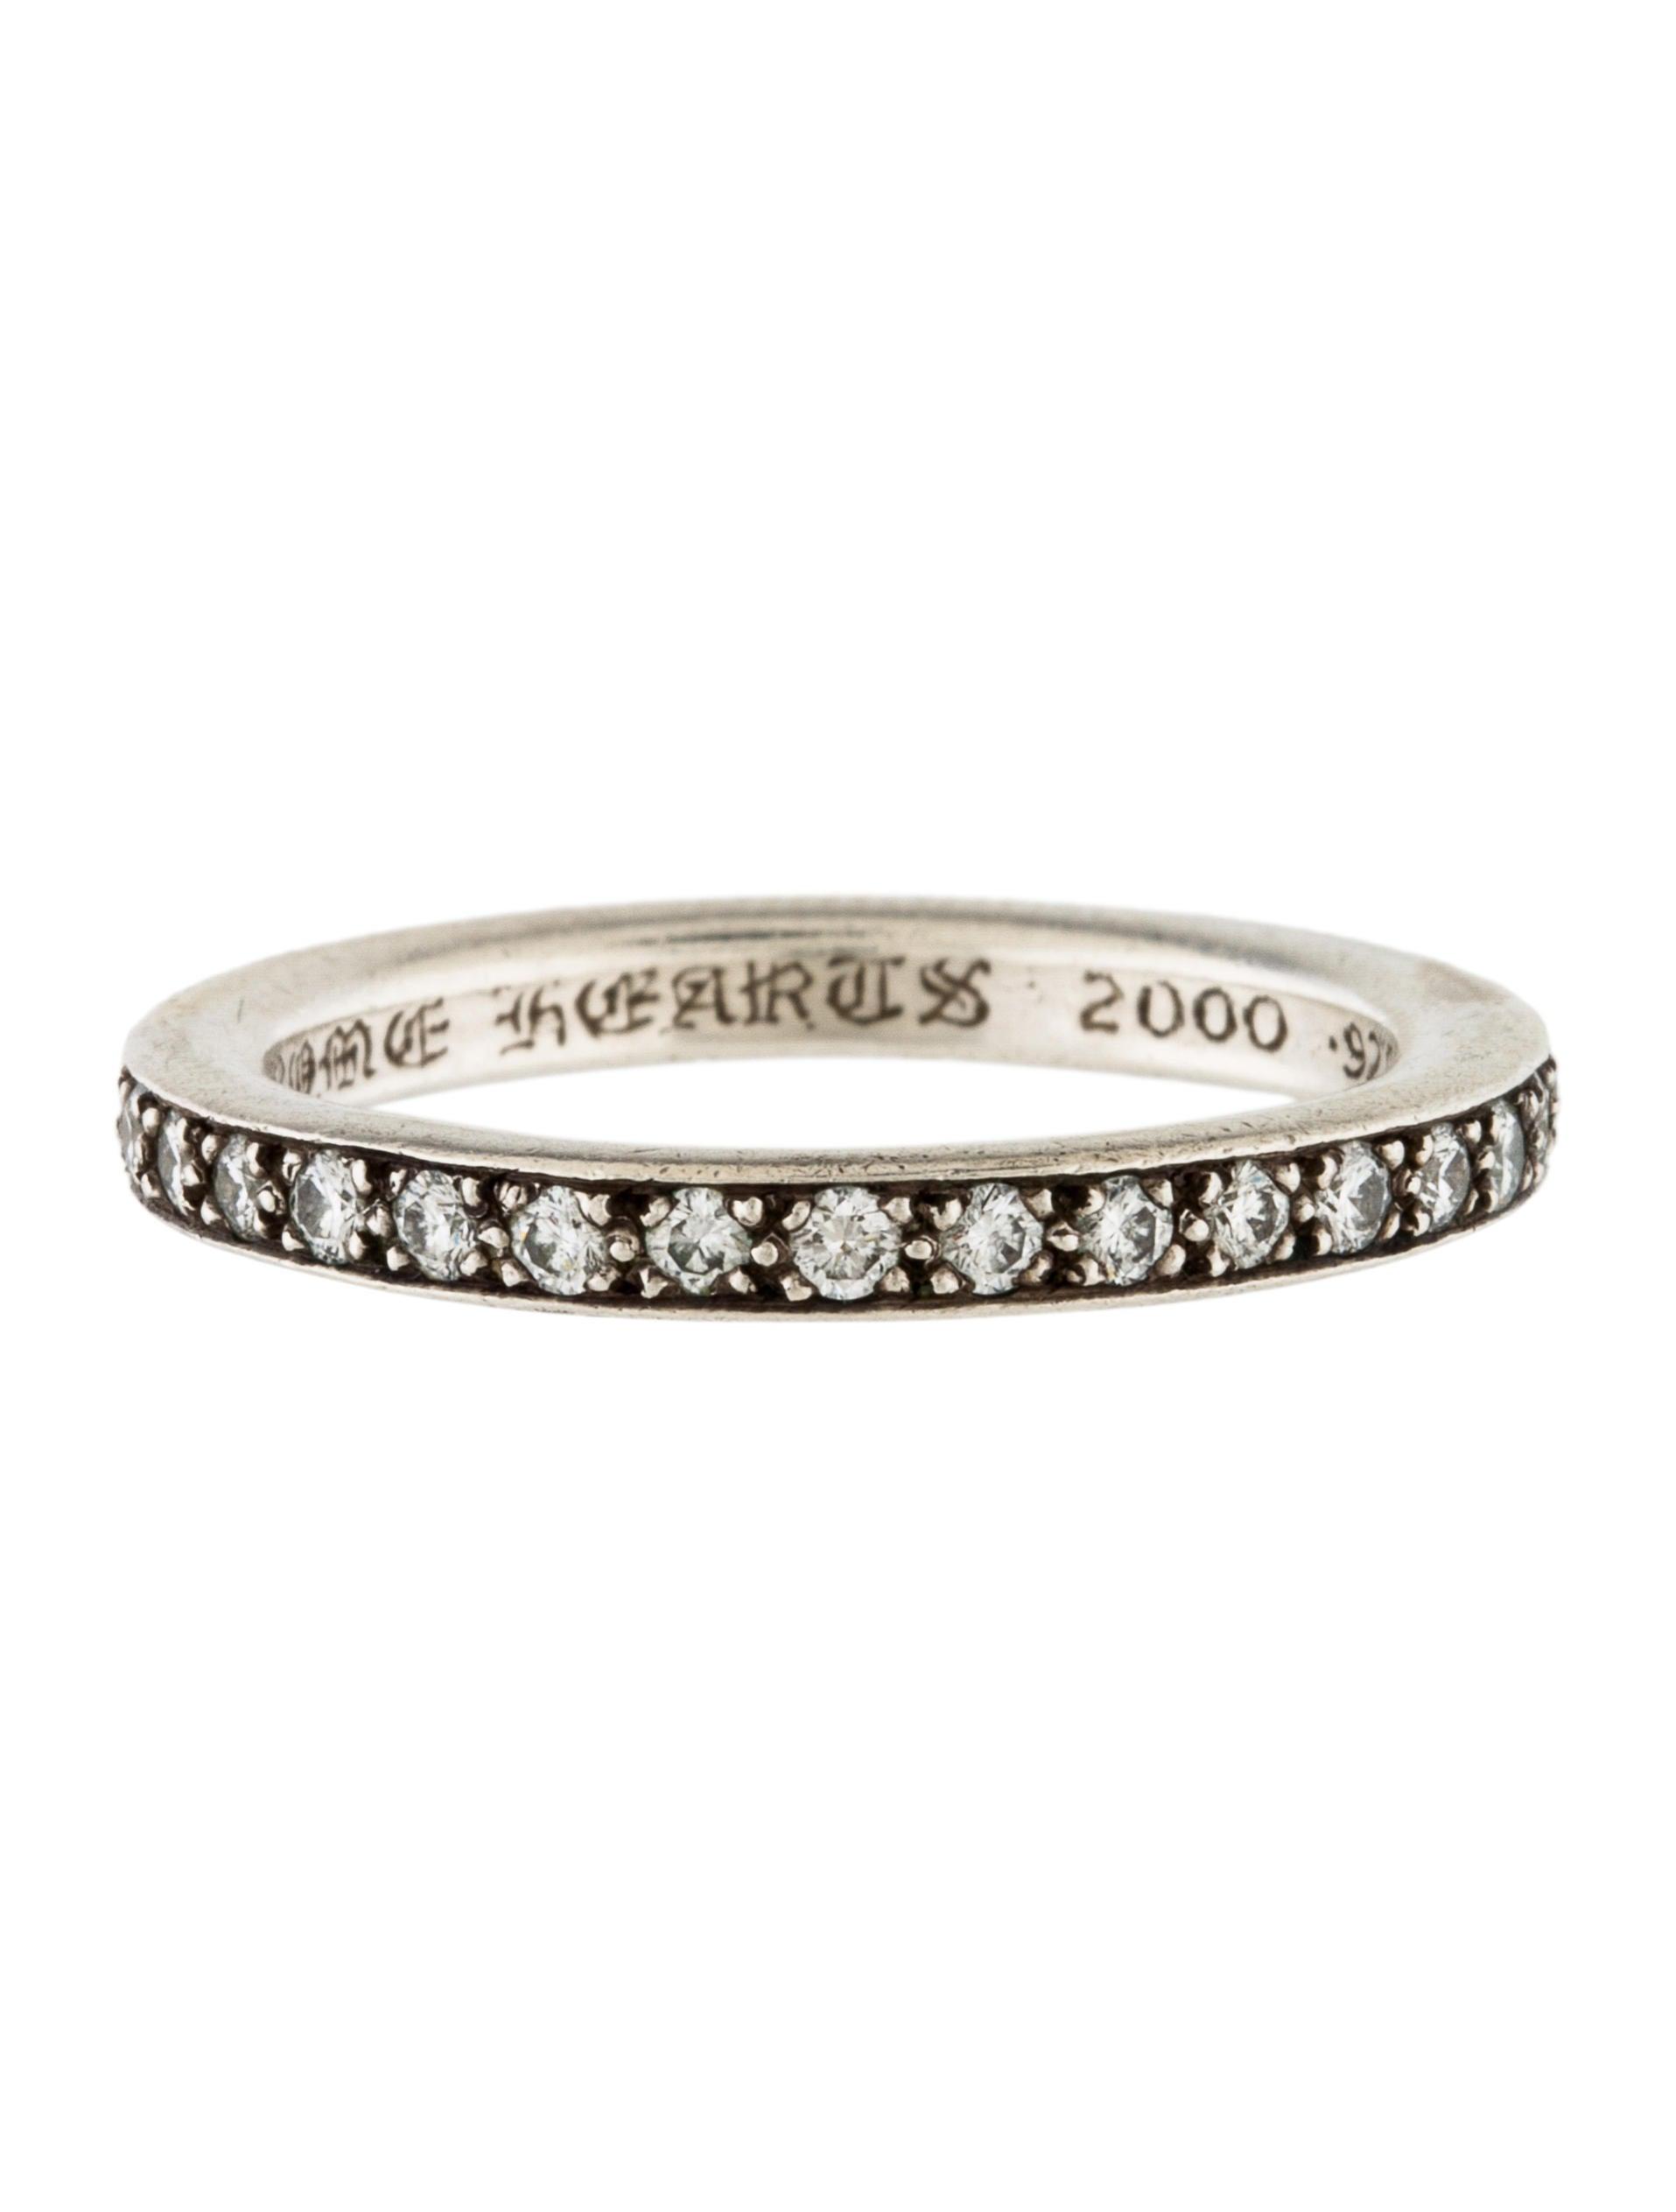 669bc5c392fb Chrome Hearts Diamond TFL Eternity Band Ring - Rings - CHH22378 ...